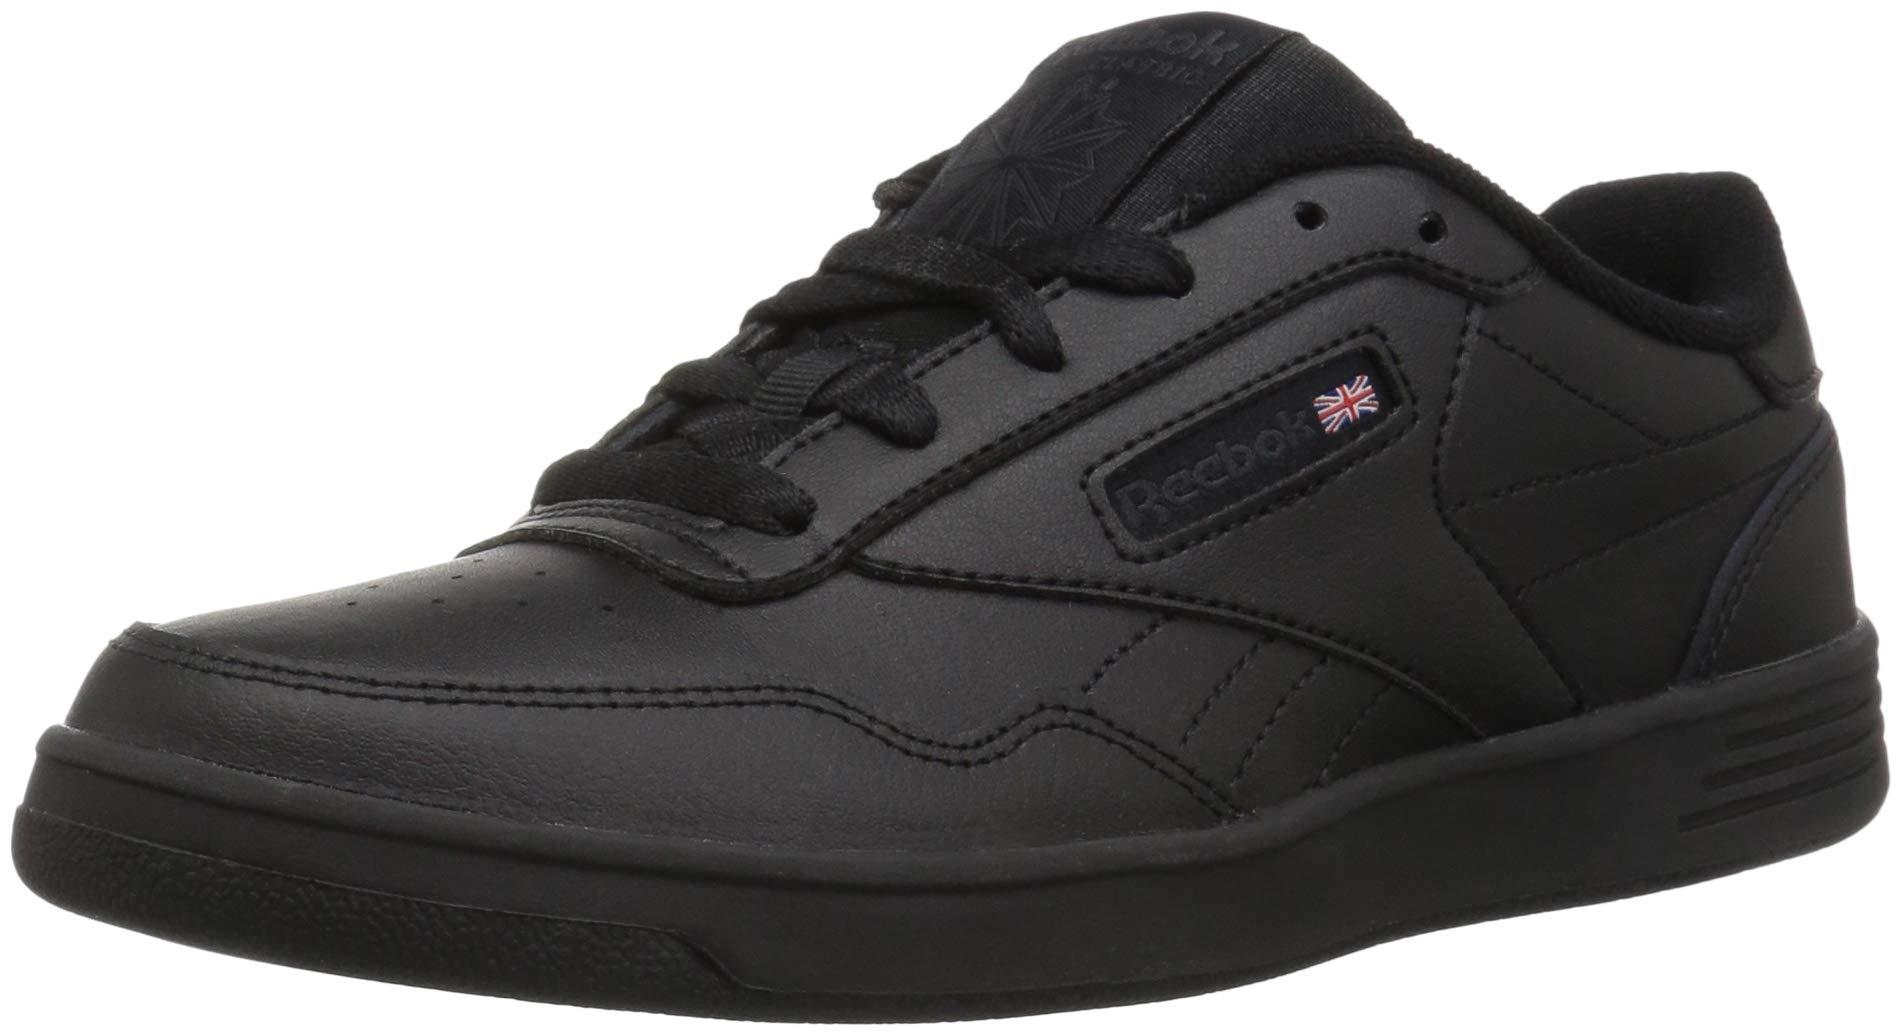 Reebok Men's Club MEMT Sneaker, Black/Dark Heather Grey/Solid Grey Wide, 6.5